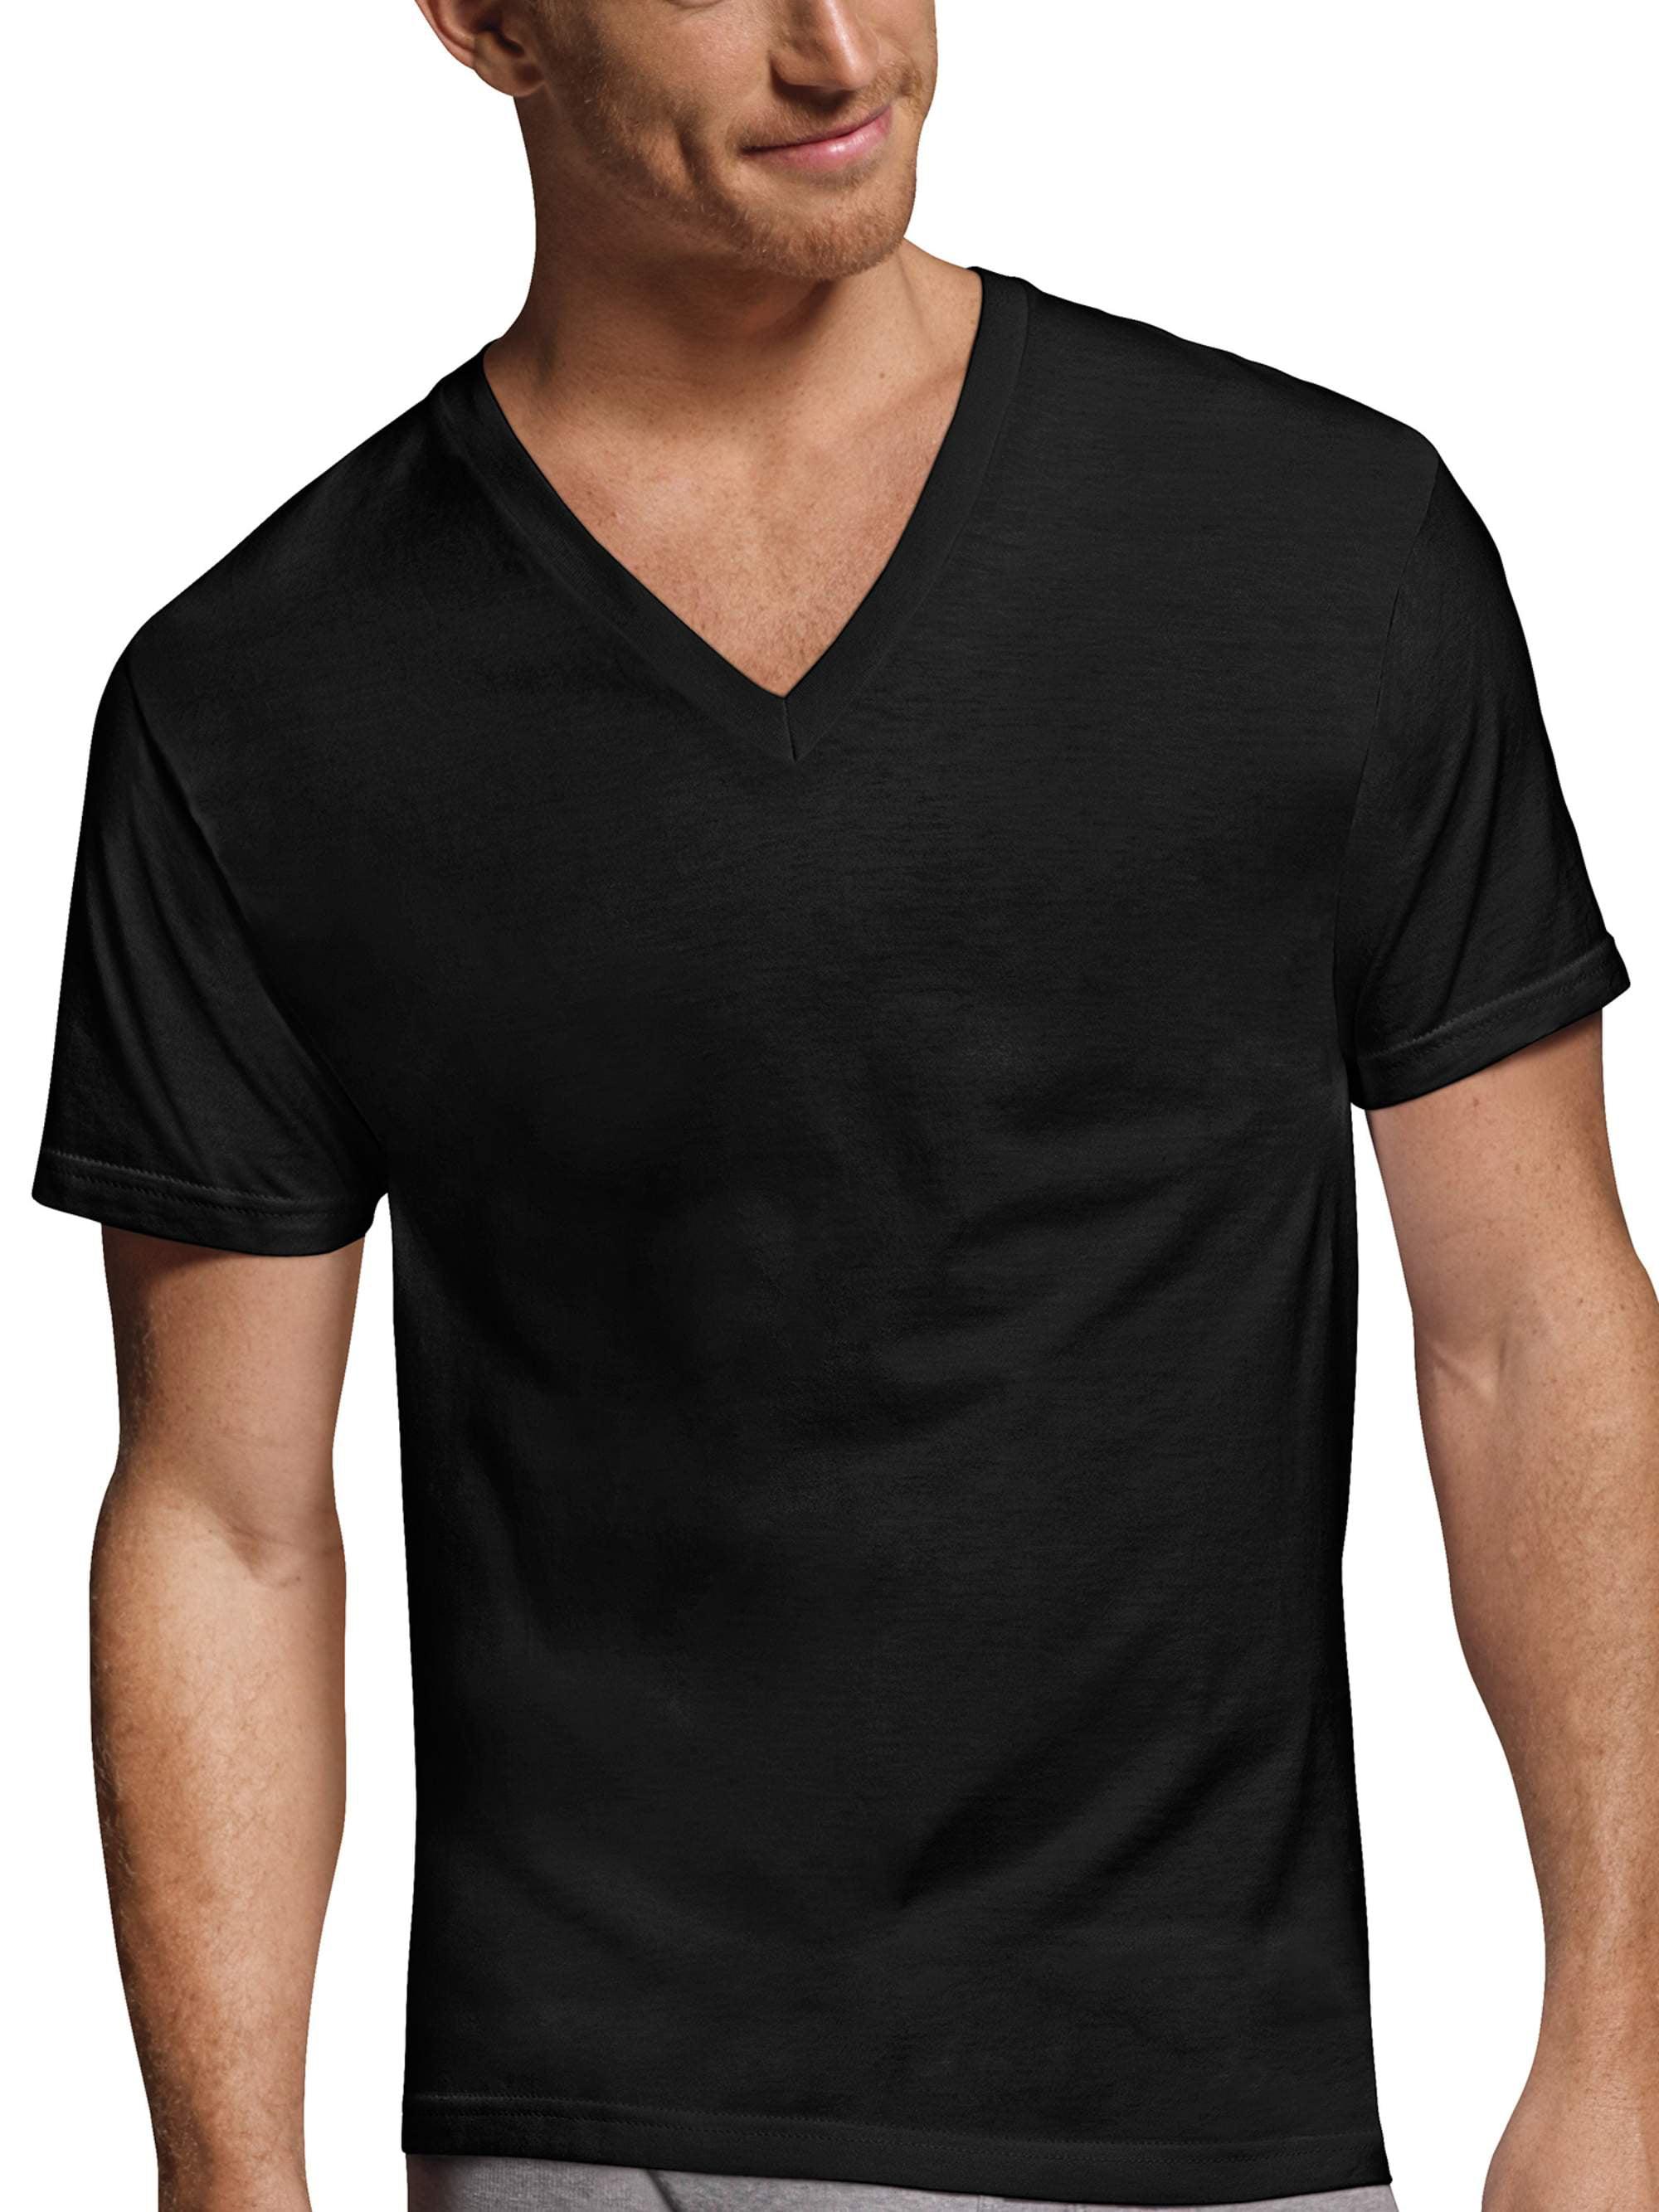 3b65b906 Hanes Comfortblend T Shirts Walmart